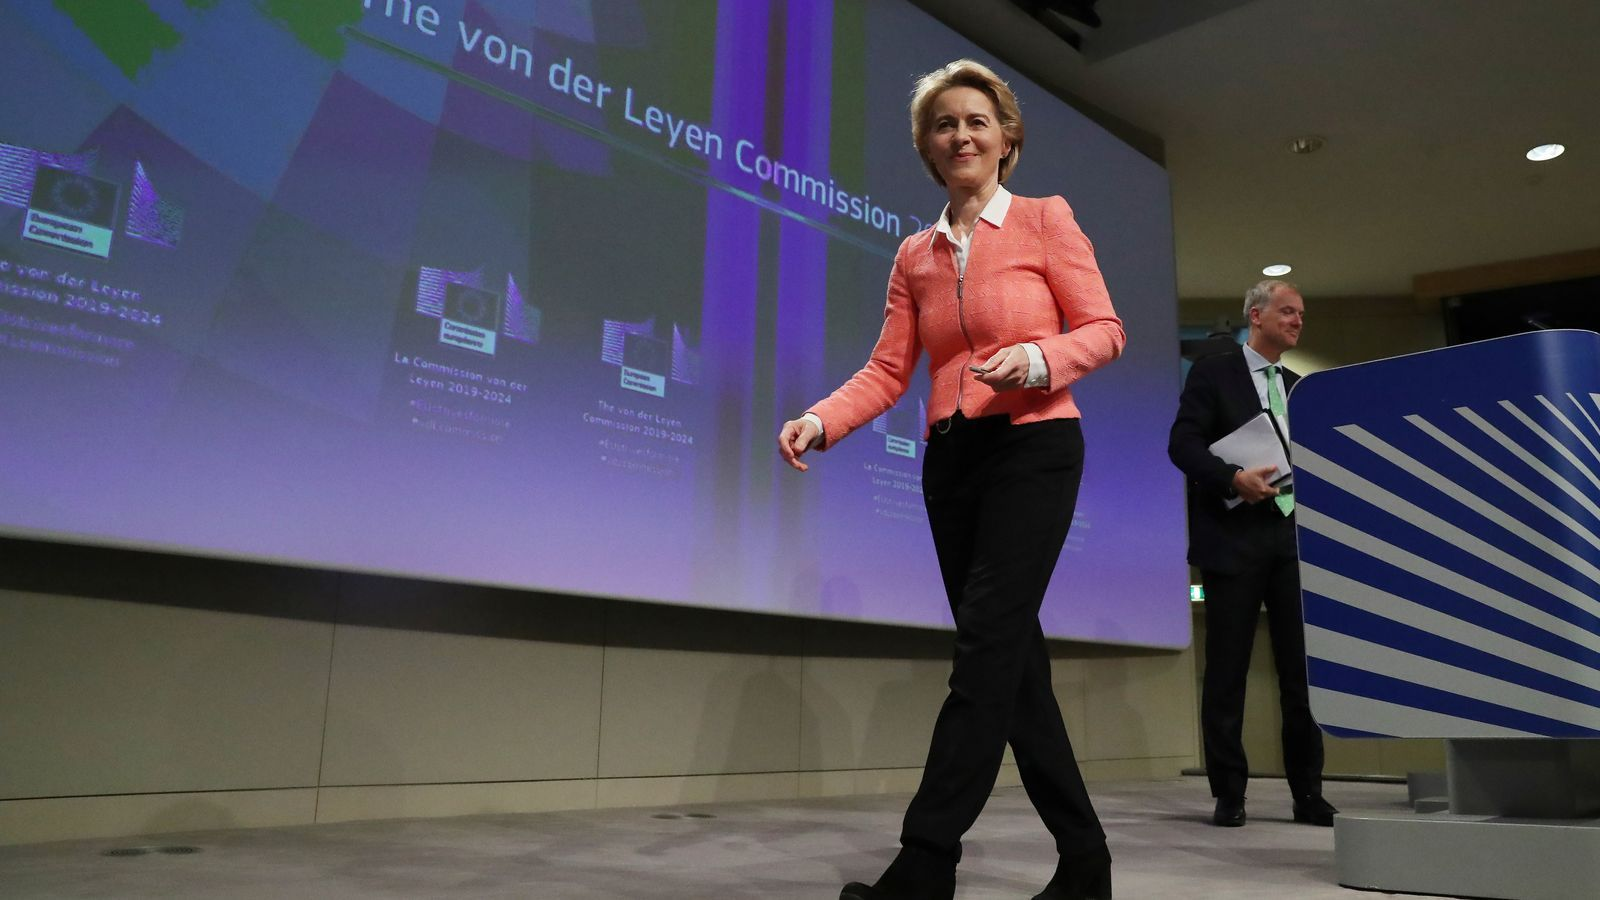 La presidenta de la Comissió Europea, Ursula von der Leyen, aquest dimarts a Brussel·les.